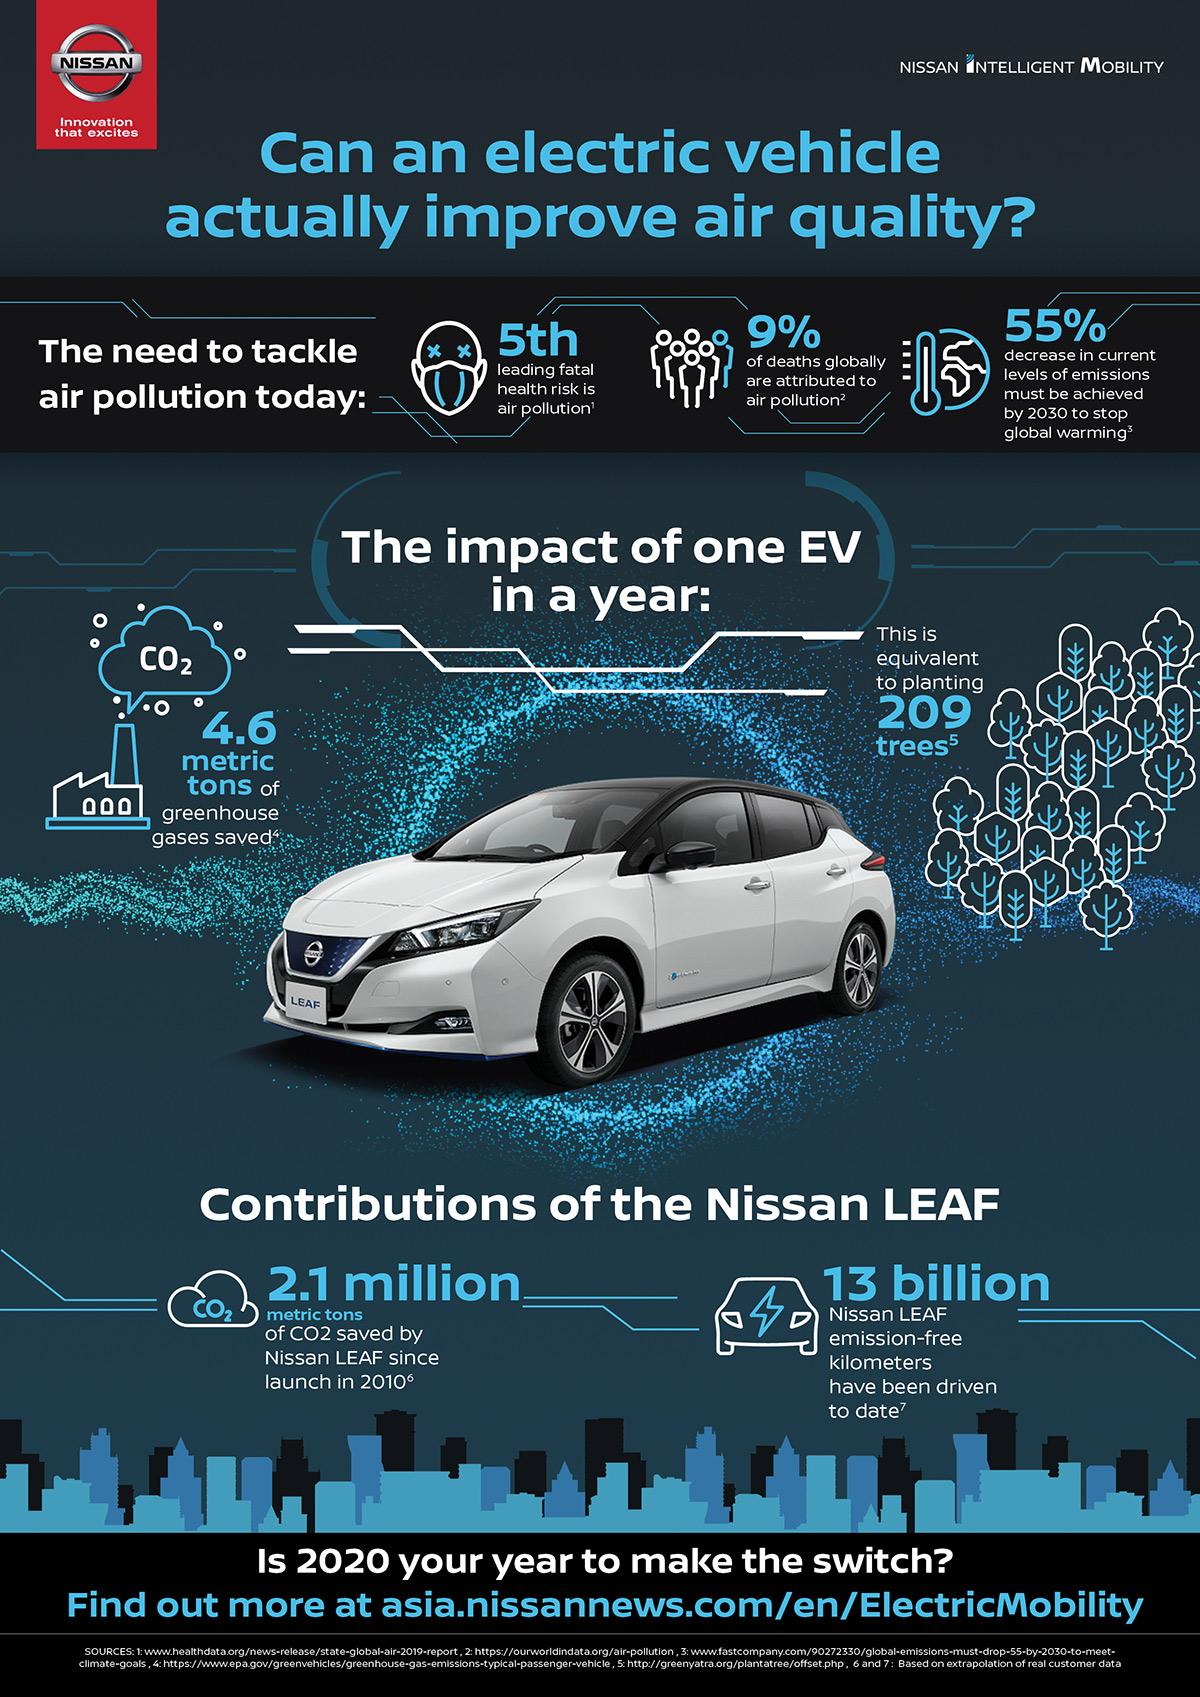 Nissan: Τα ηλεκτρικά οχήματα μπορούν να βοηθήσουν στην αντιμετώπιση της ατμοσφαιρικής ρύπανσης